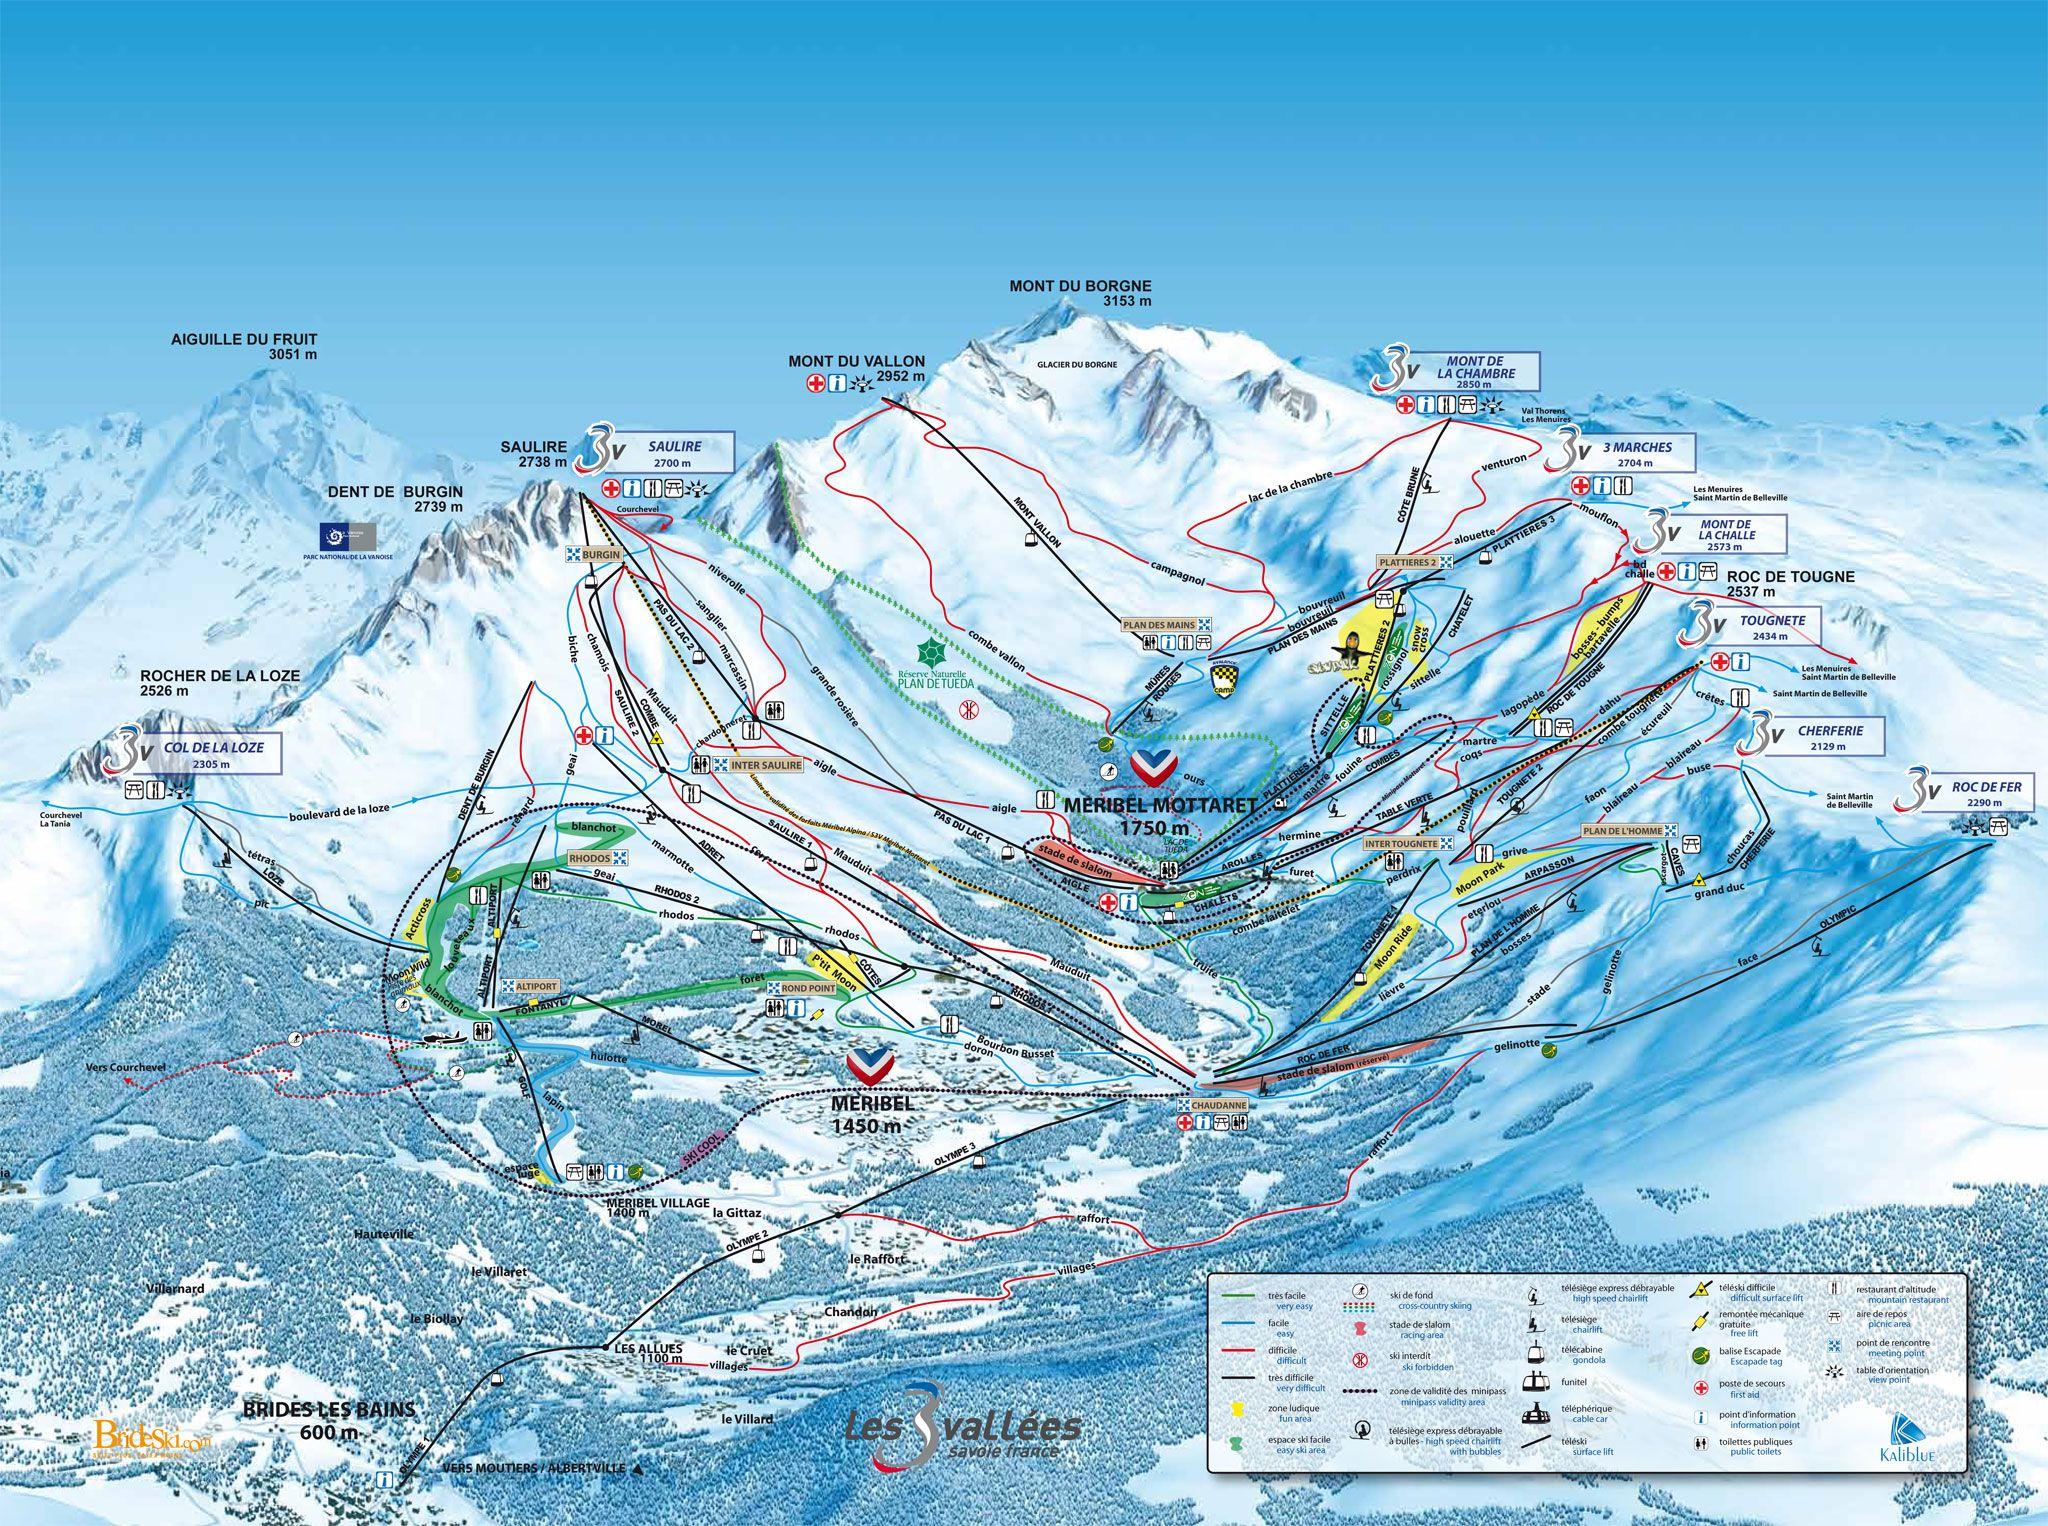 Brides-les-Bains airport transfers | Alps2Alps